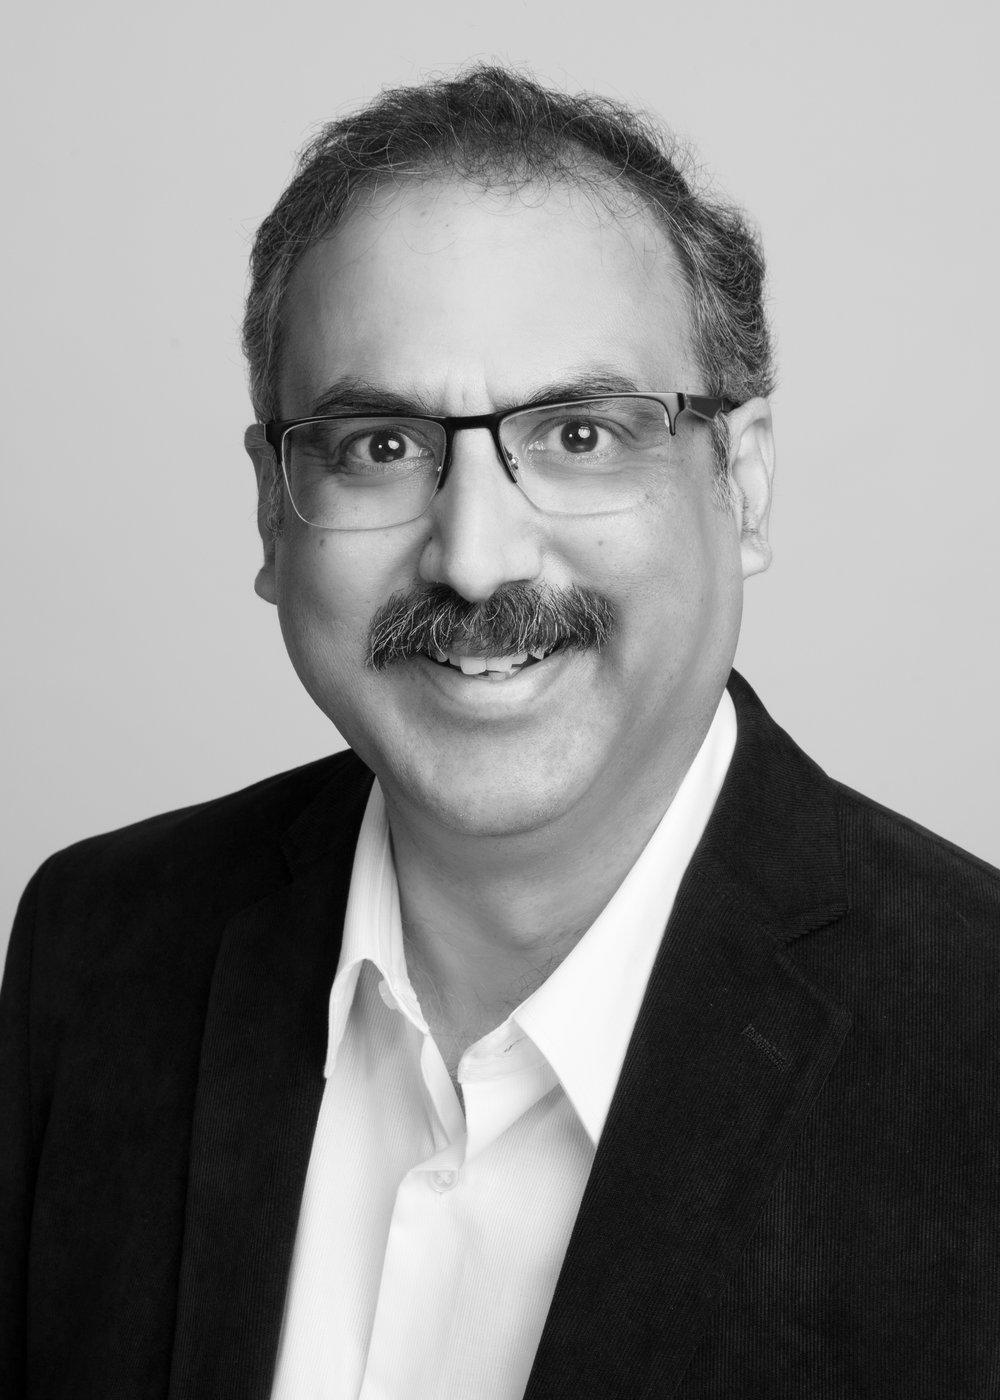 Reltio Arihant Jain